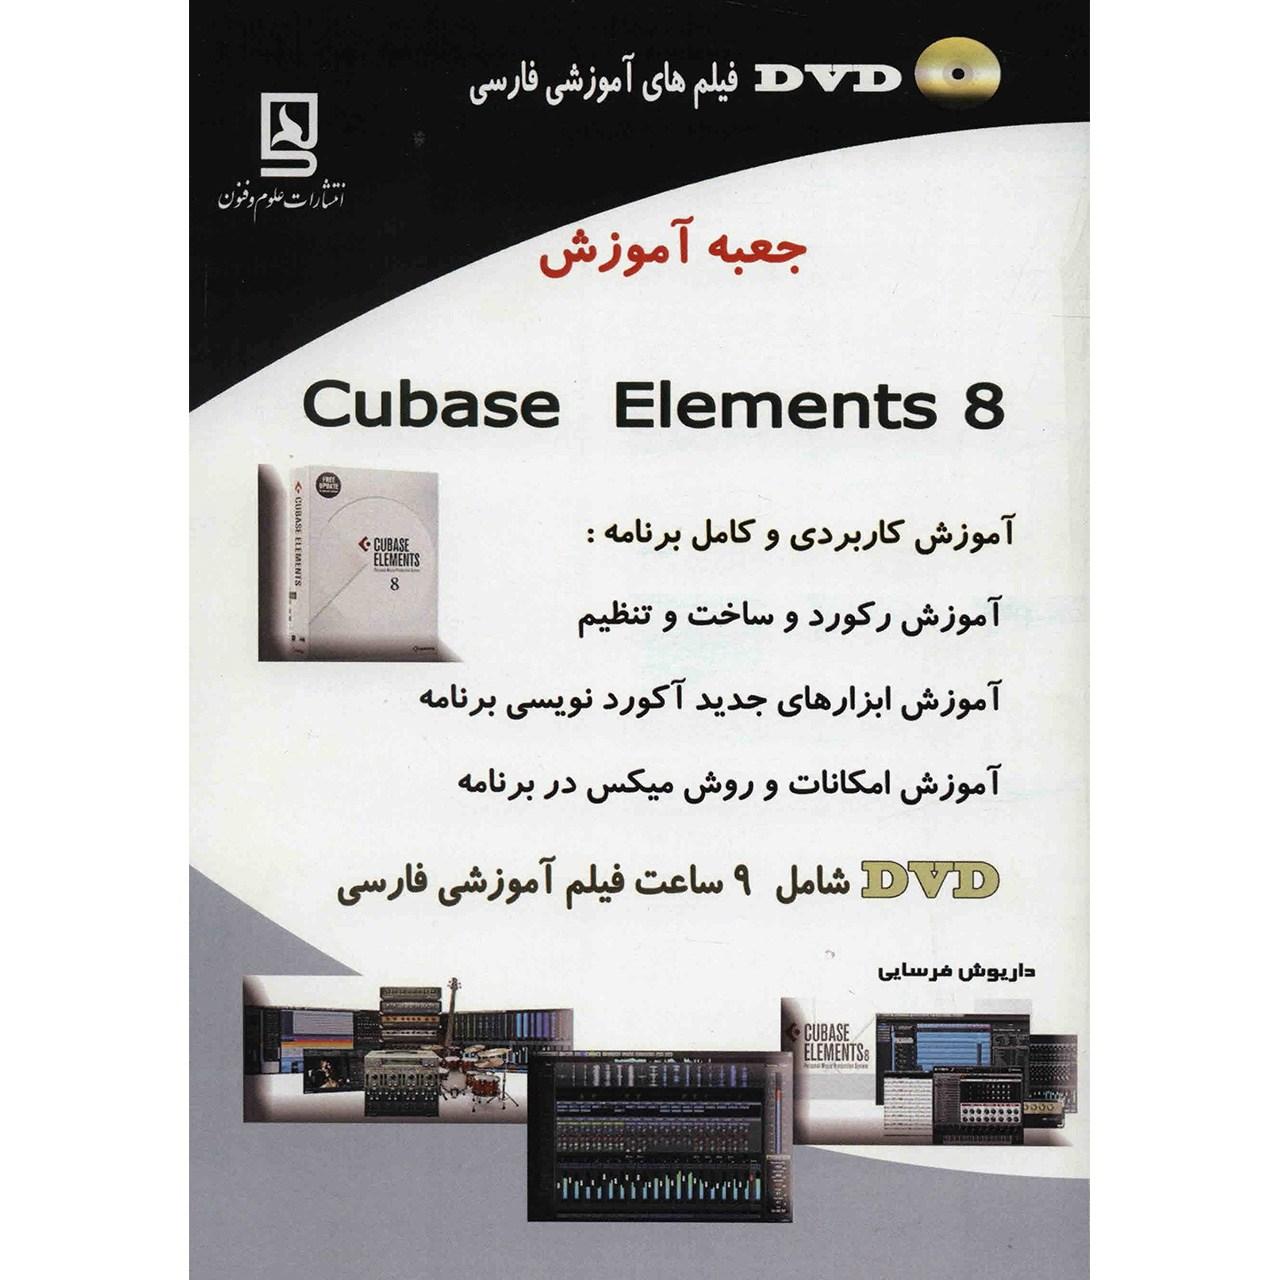 کتاب جعبه آموزش Cubase Elements 8 اثر داریوش فرسایی